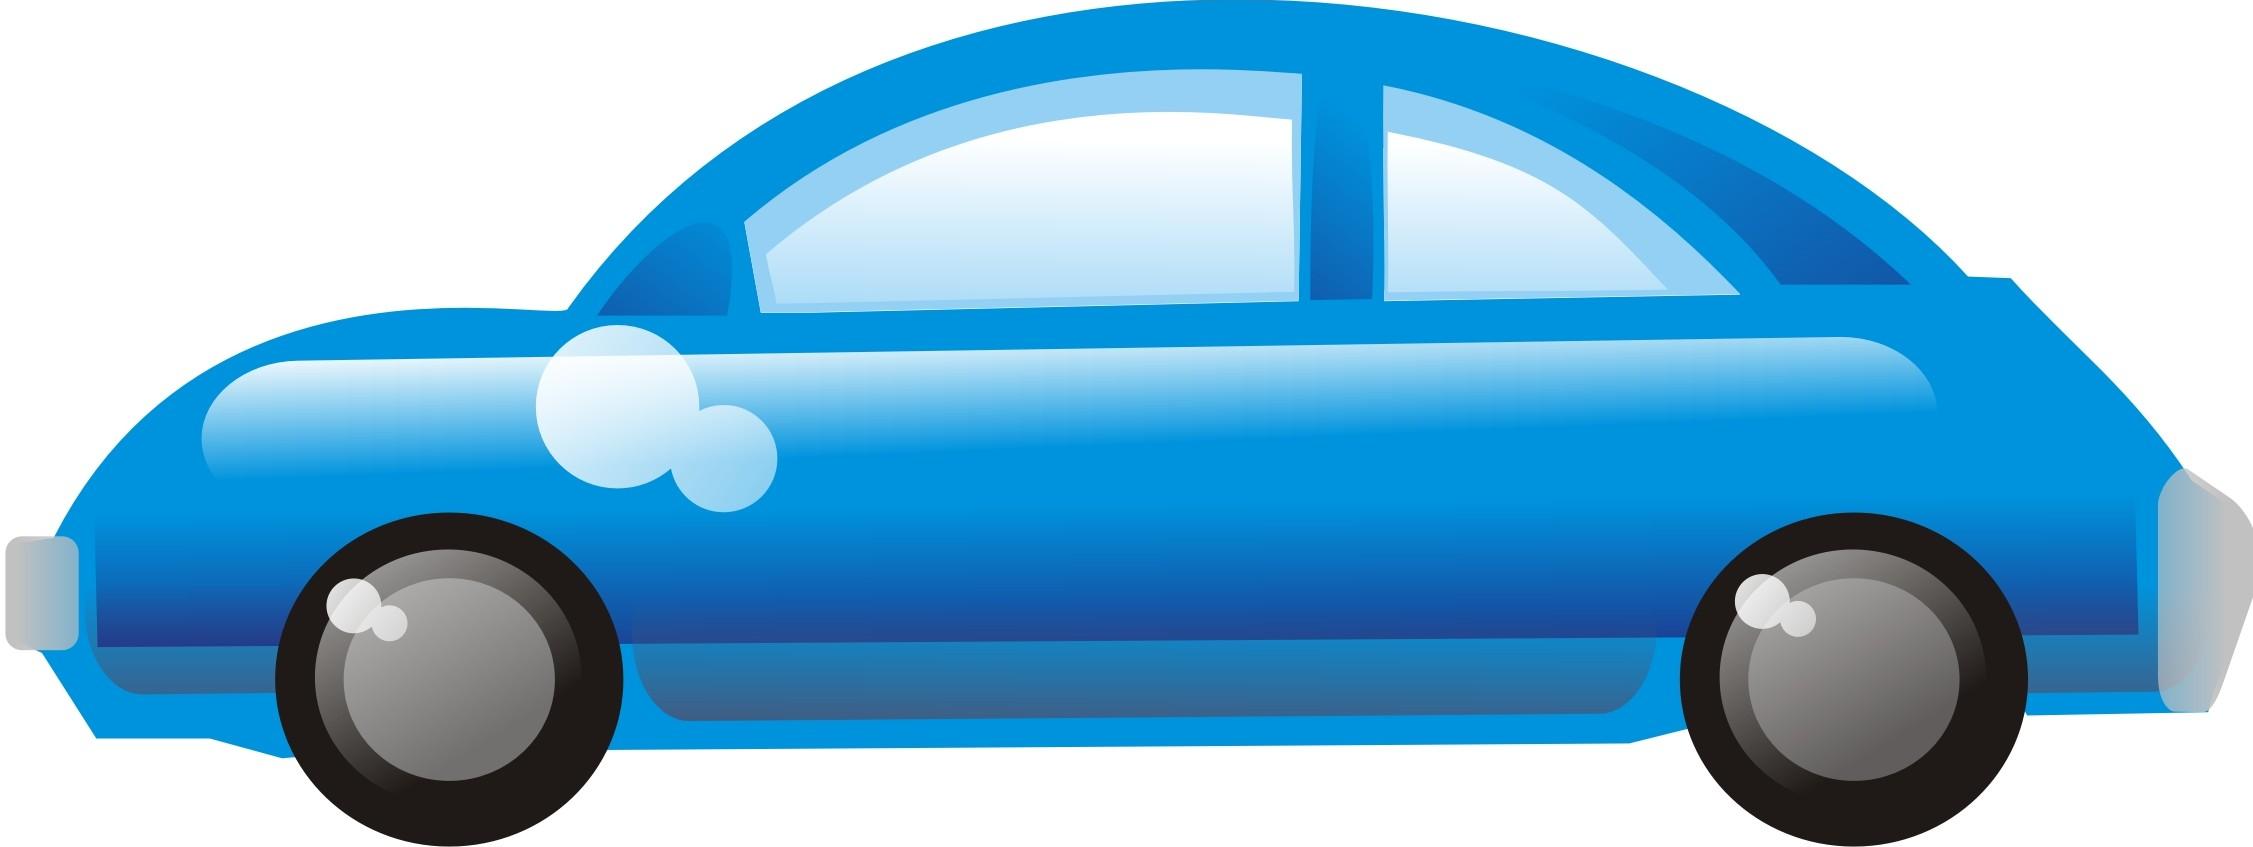 Cars blue car clipart.